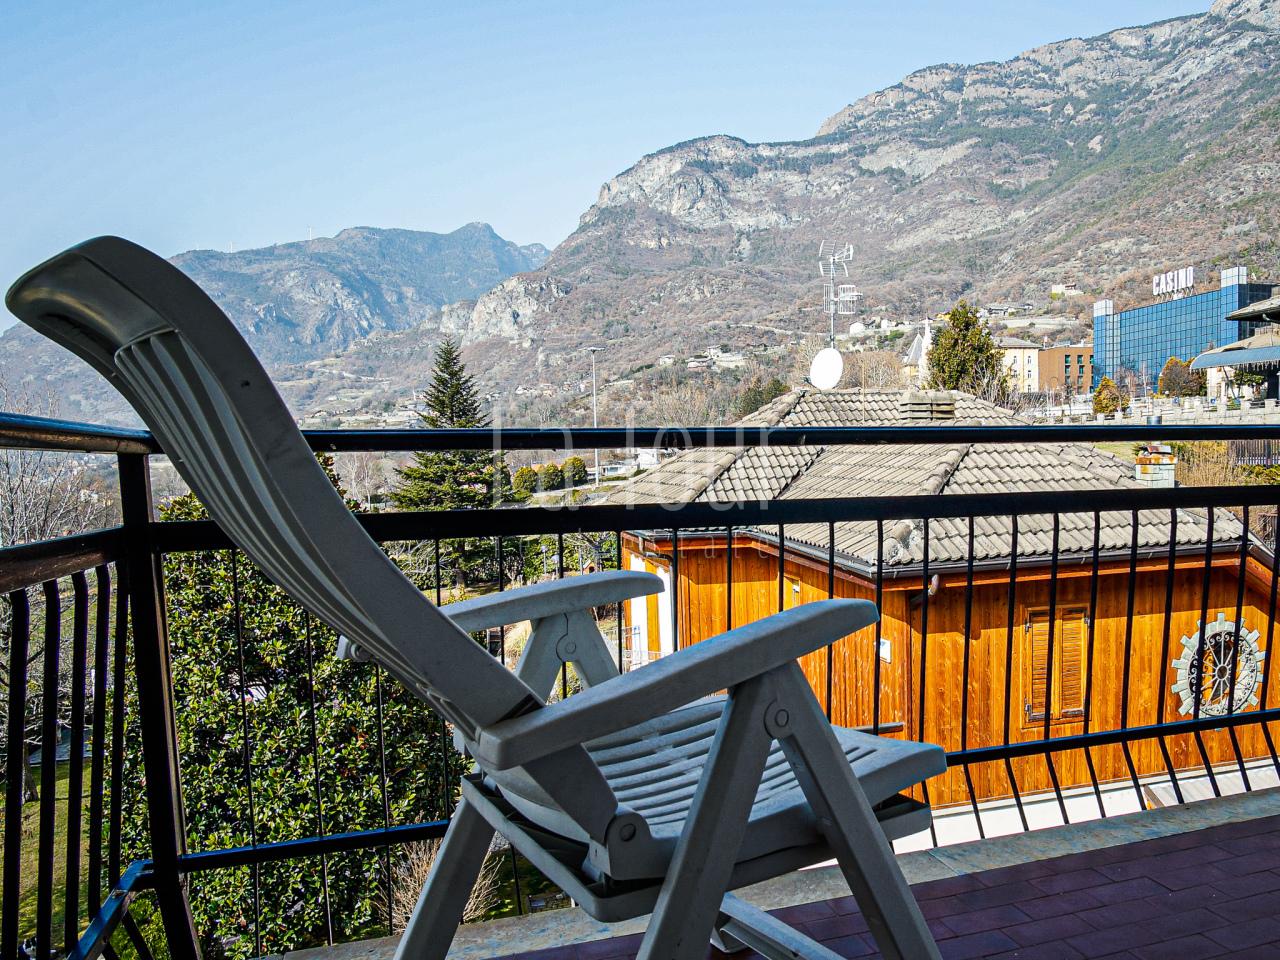 Appartamento in vendita a Saint-vincent (AO)